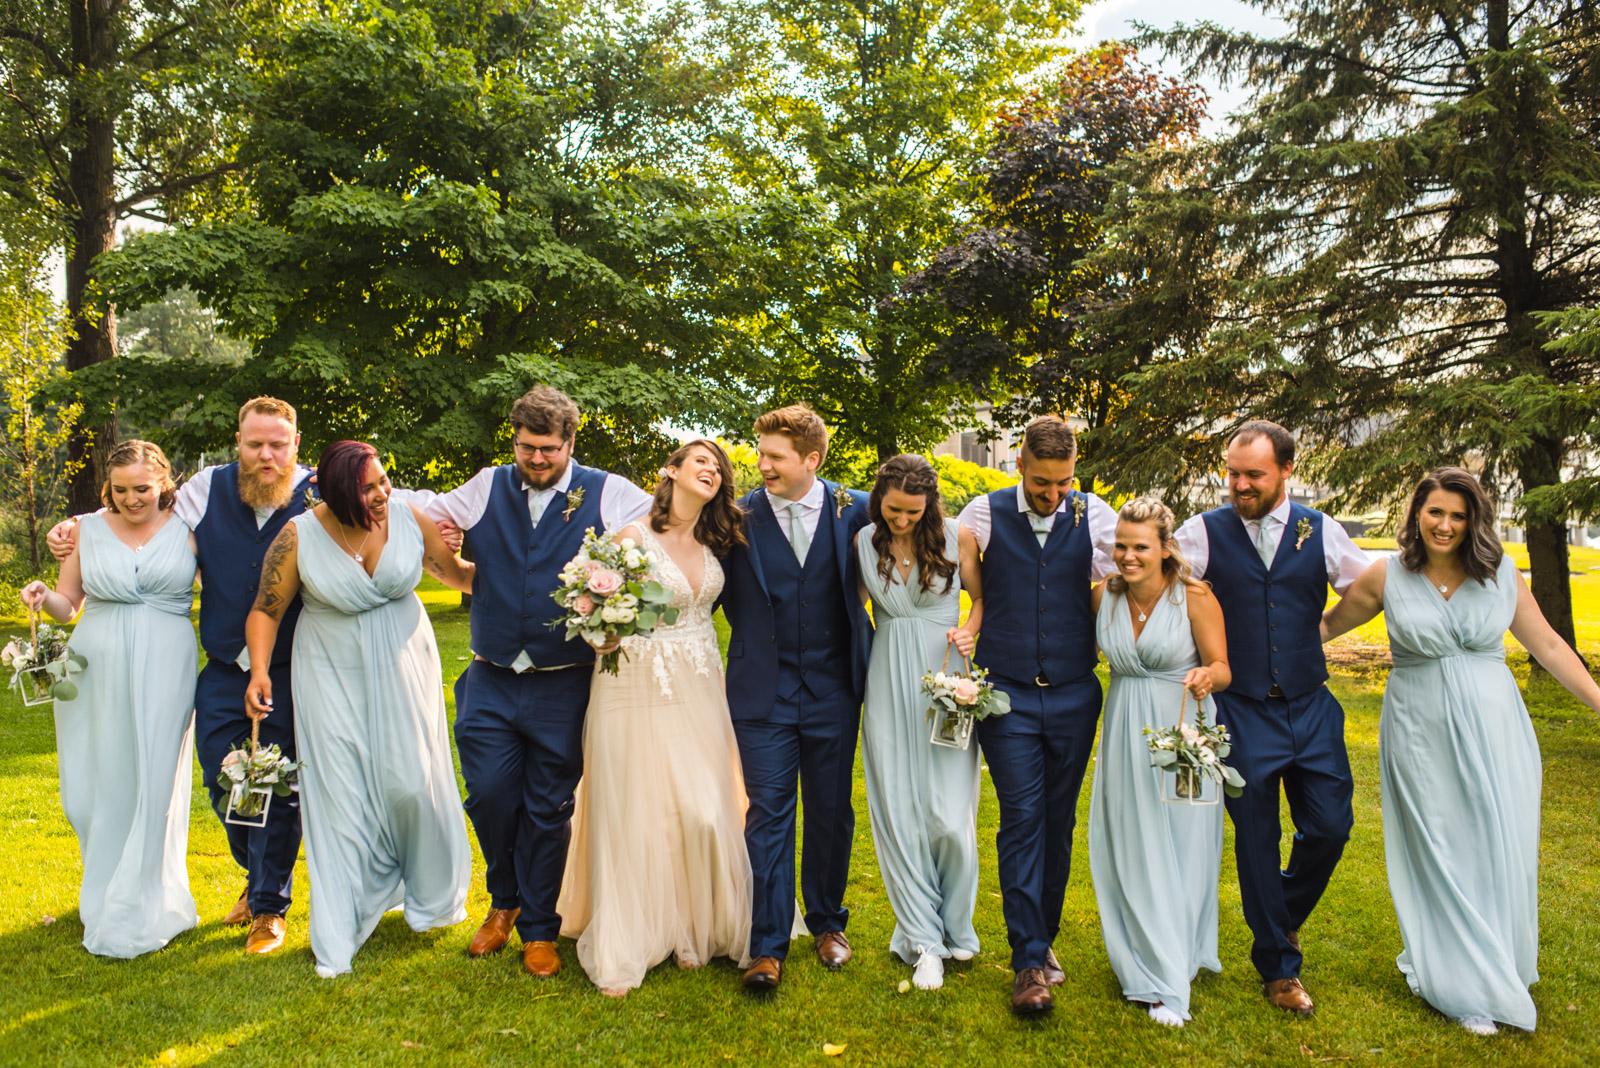 Emerson & Elicia's Golf Course Wedding Aidan & Leanne Hennebry Hamilton Wedding Videographers Photographers Niagara Hush Hush Photography & Film-42.jpg